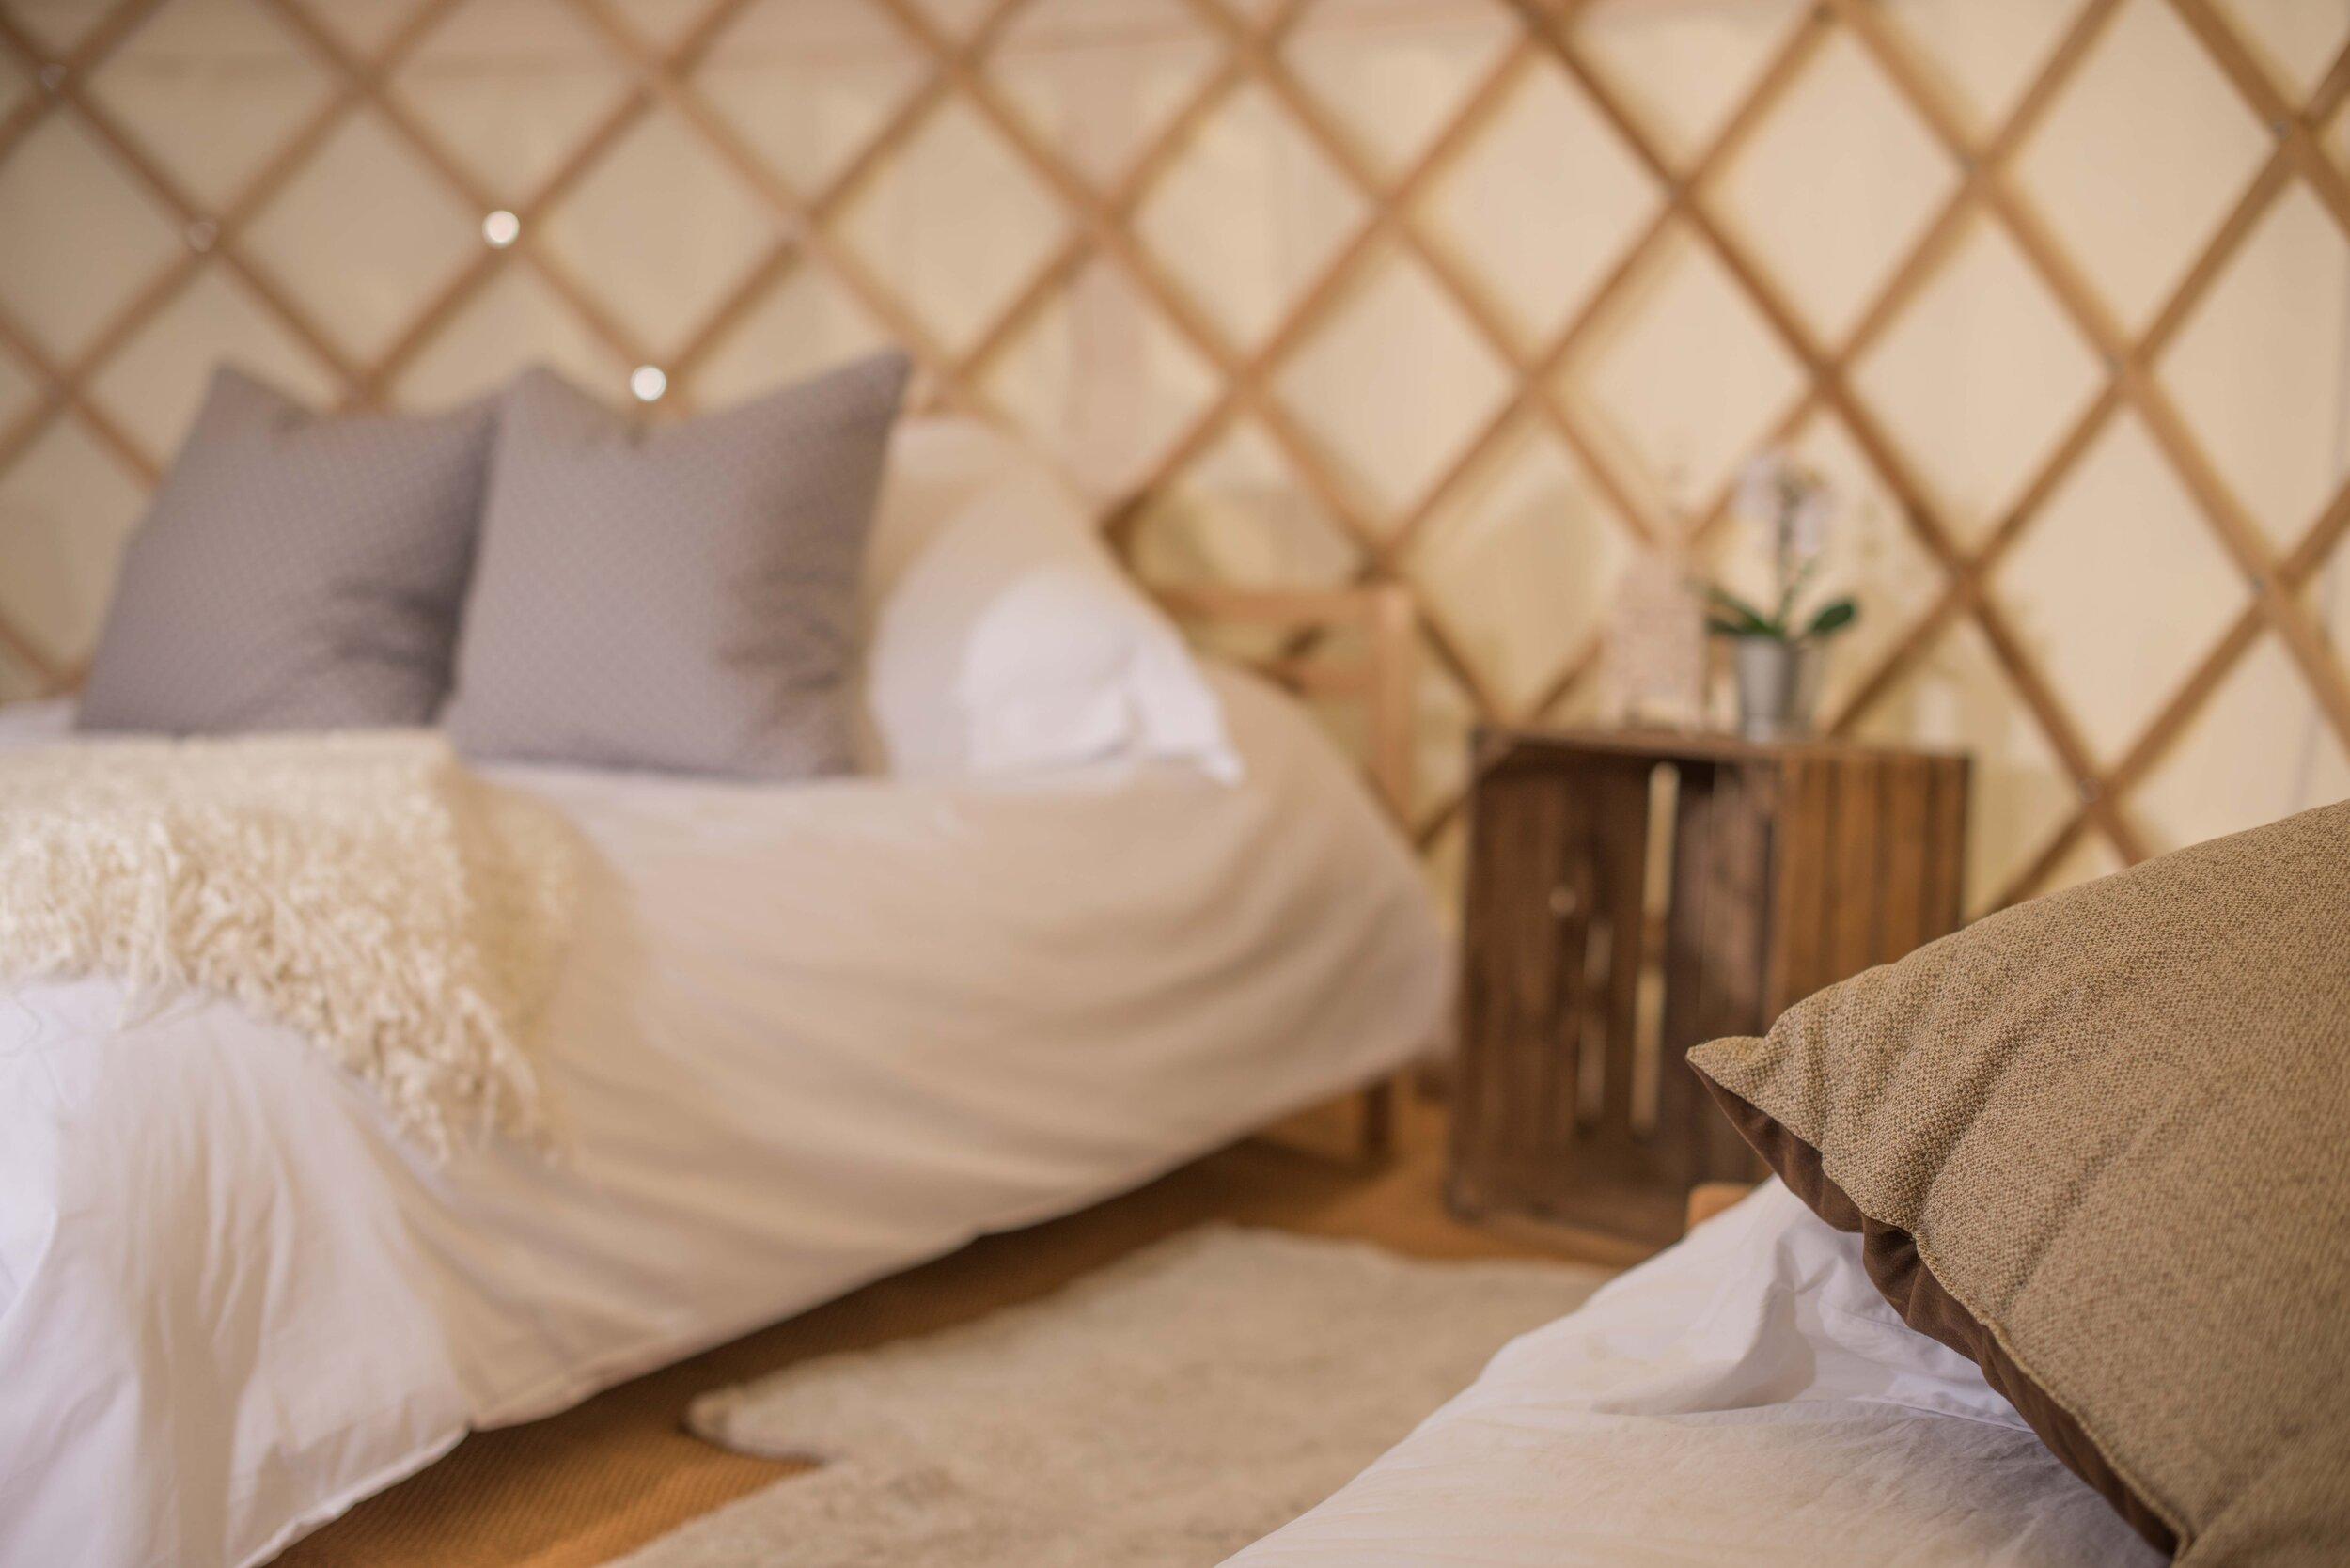 8, hotel_bell_tent_luxury_yurt.jpg